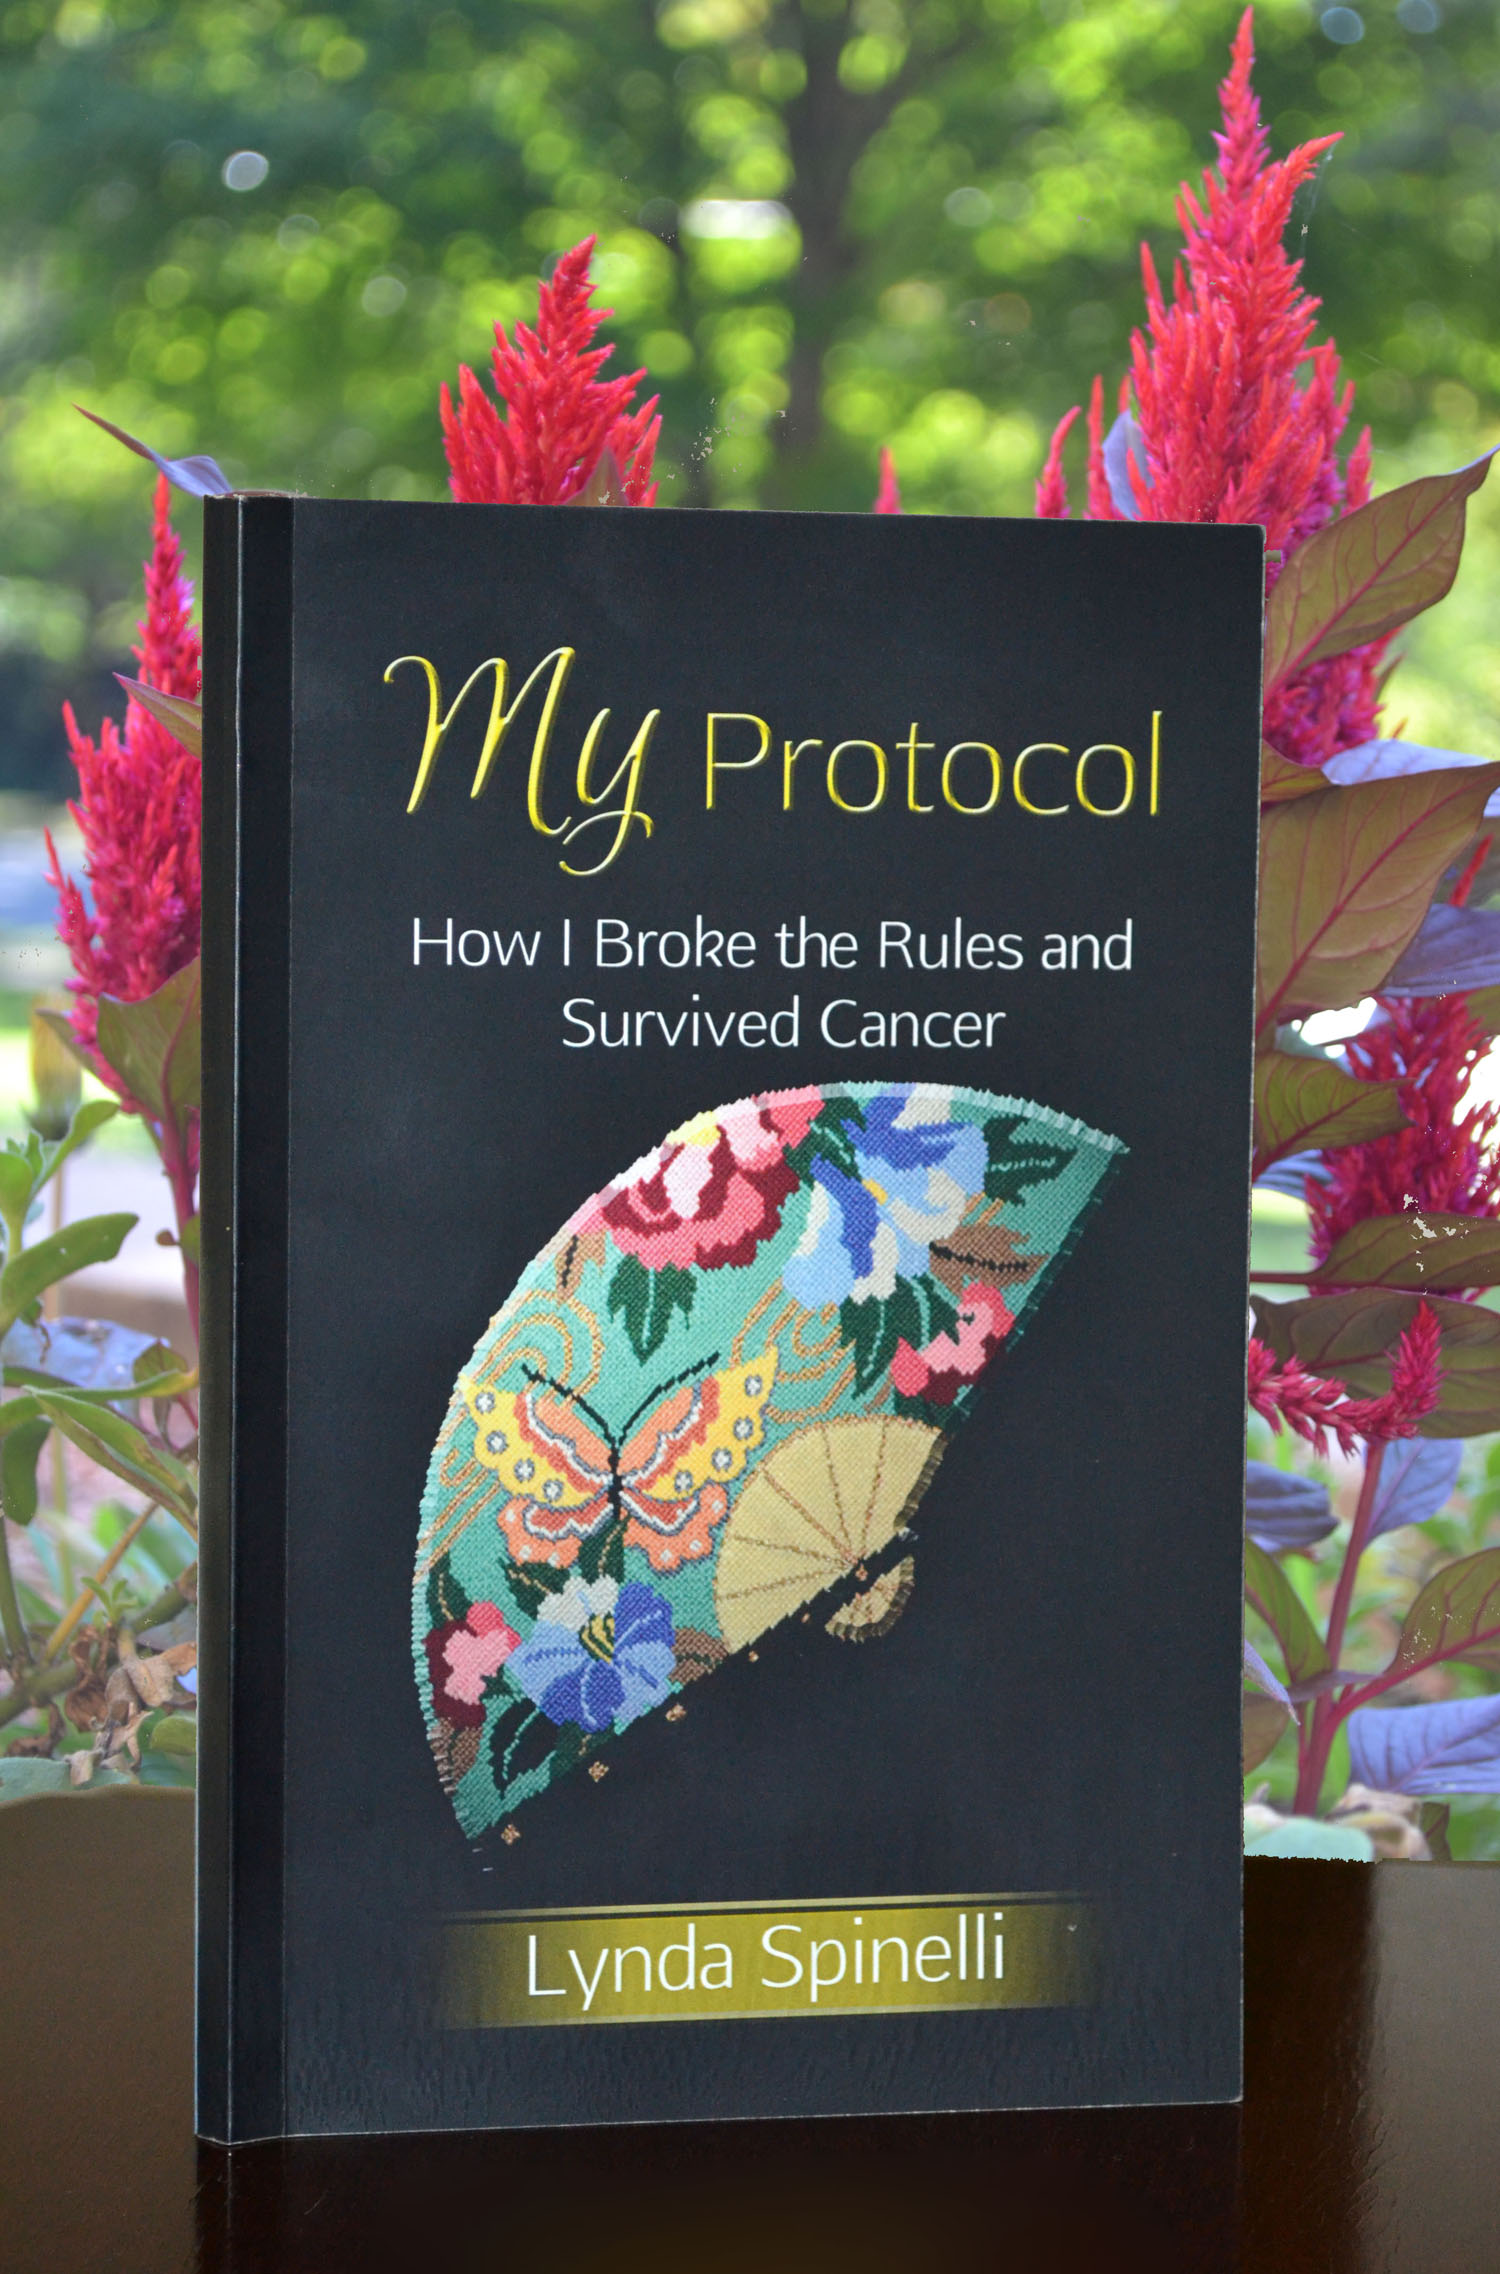 Our memoir services my protocol book by lynda spinelli 300 dpi solutioingenieria Choice Image